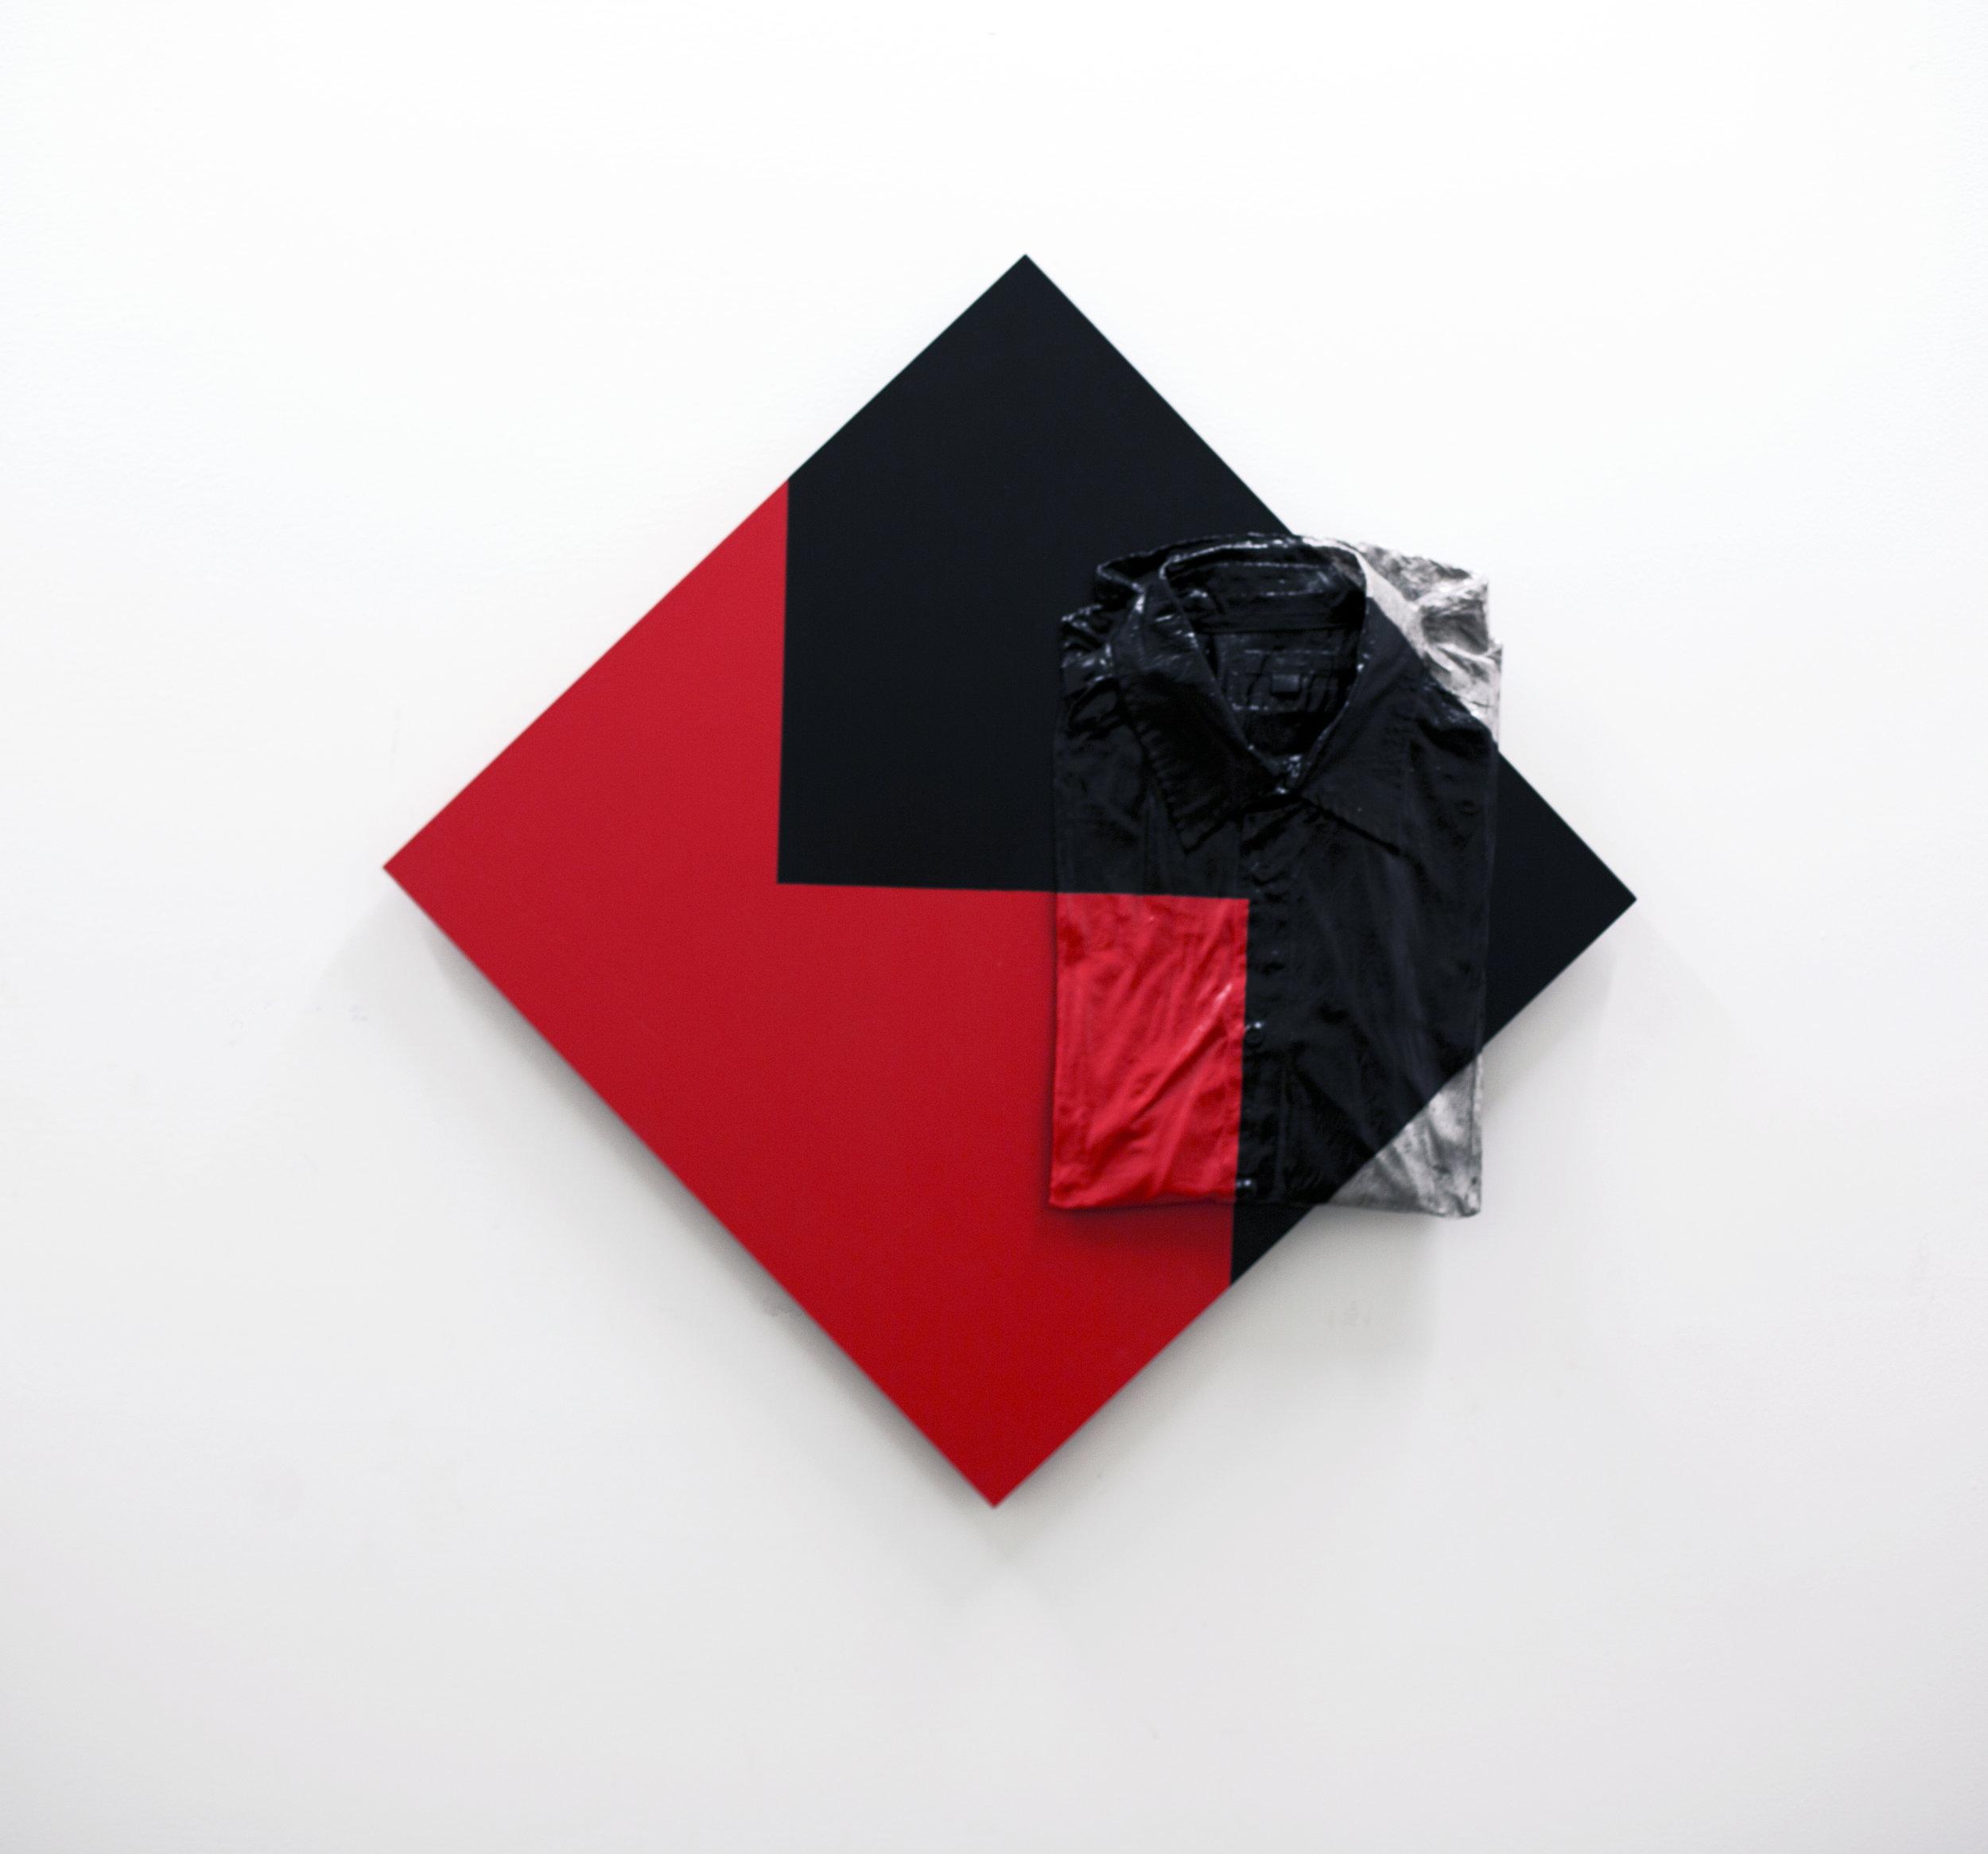 """Interlock object"" (Target no. 99),  28x28x2 ½"" 71x71x6 cm, oil painted aluminium casting on wood, 2018"